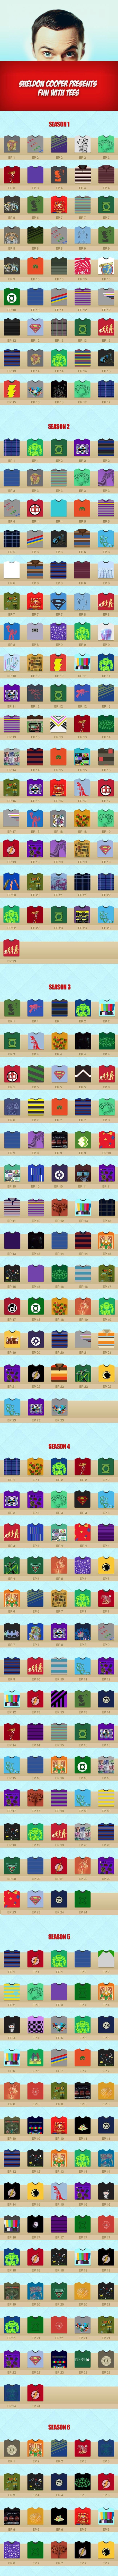 Sheldon Cooper T-Shirts Infographic